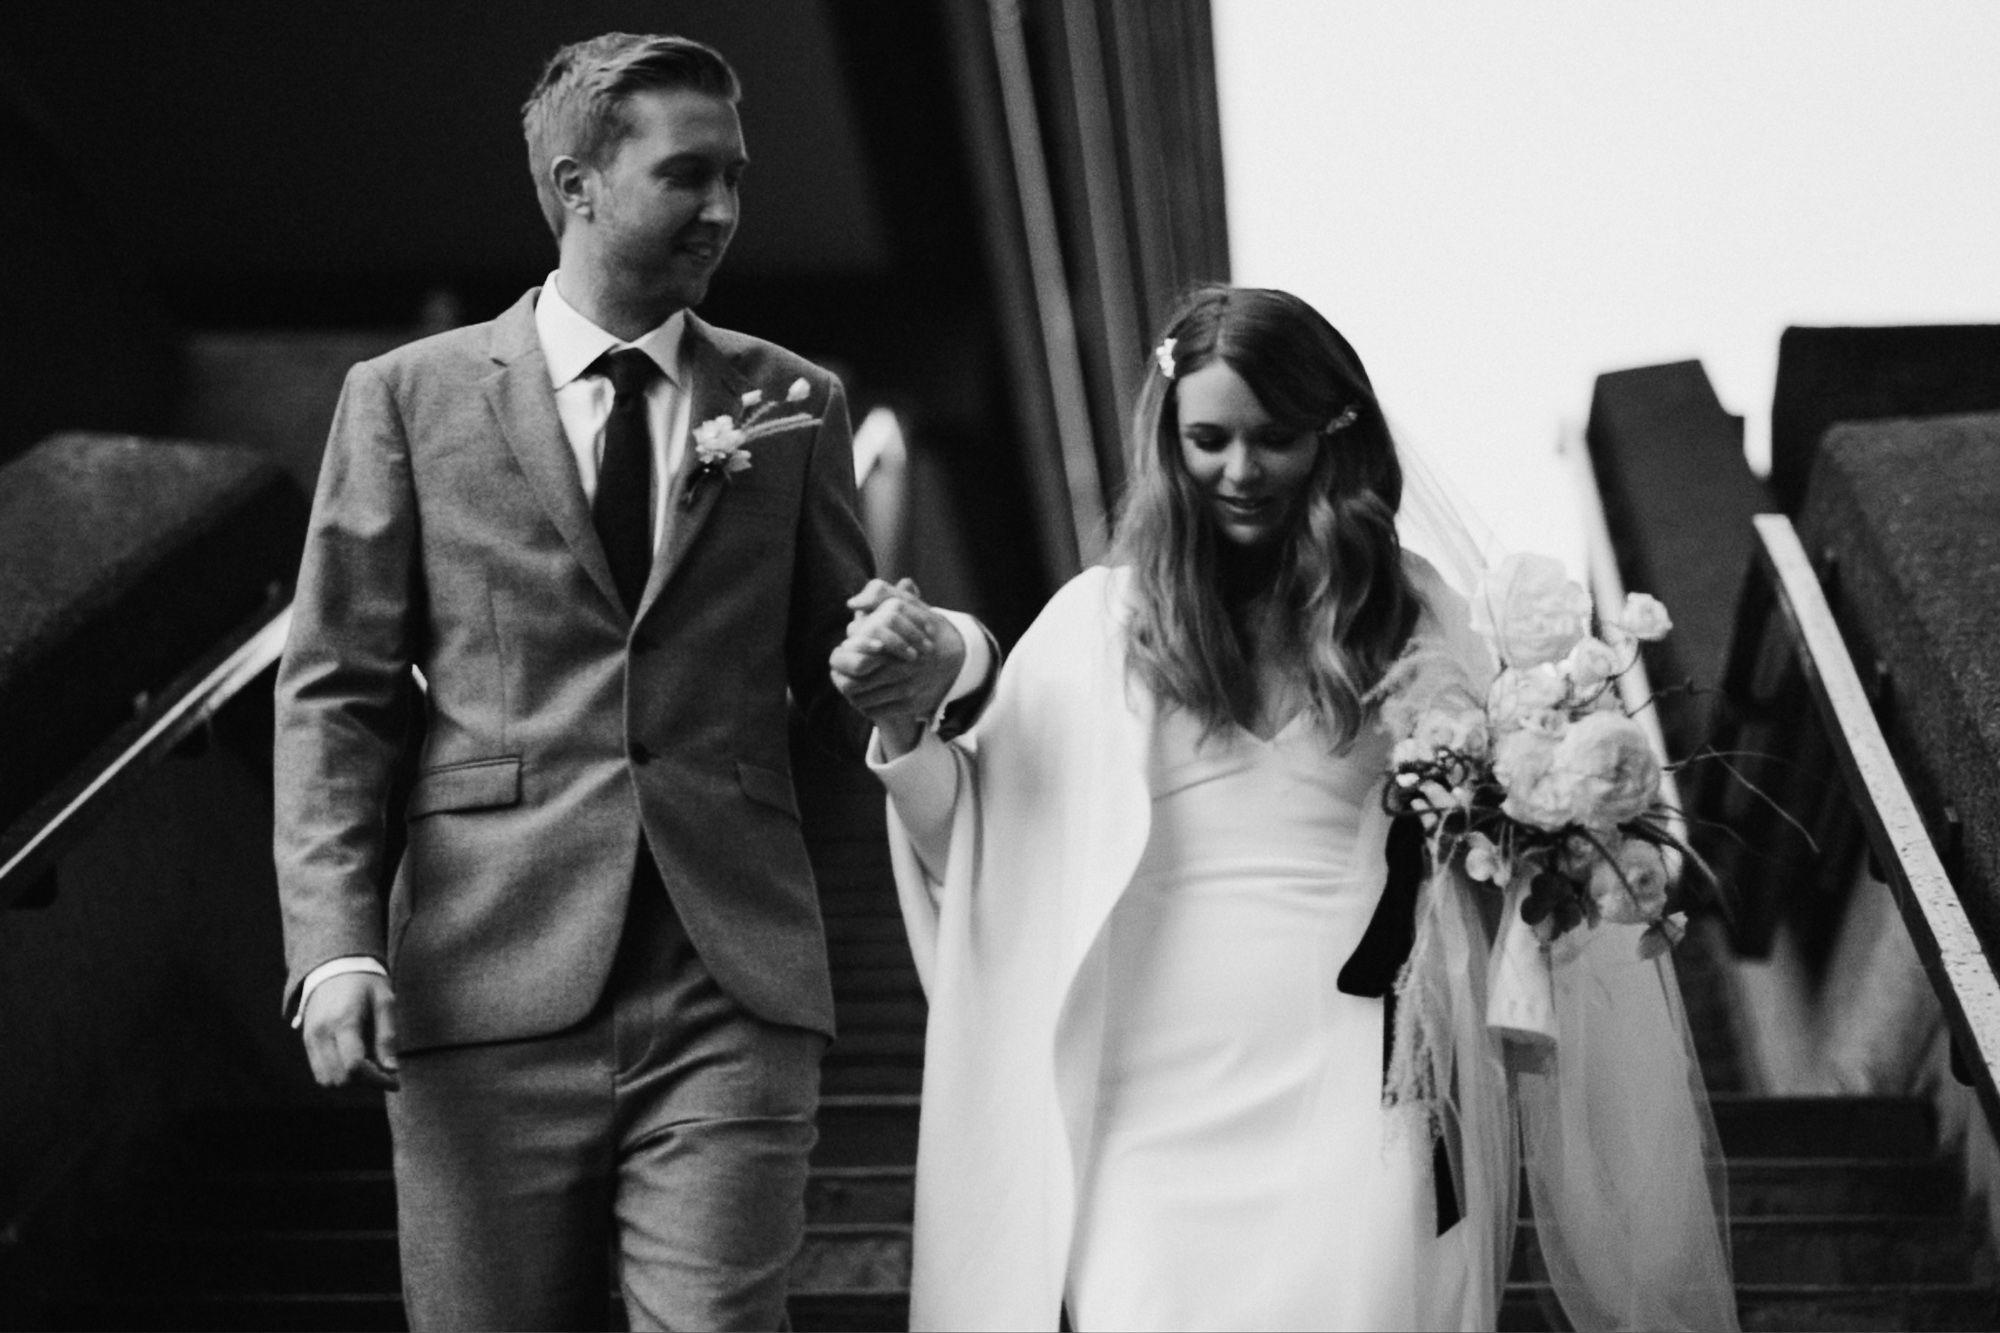 A film by Londonbased Wedding Videographer Tynegate Films